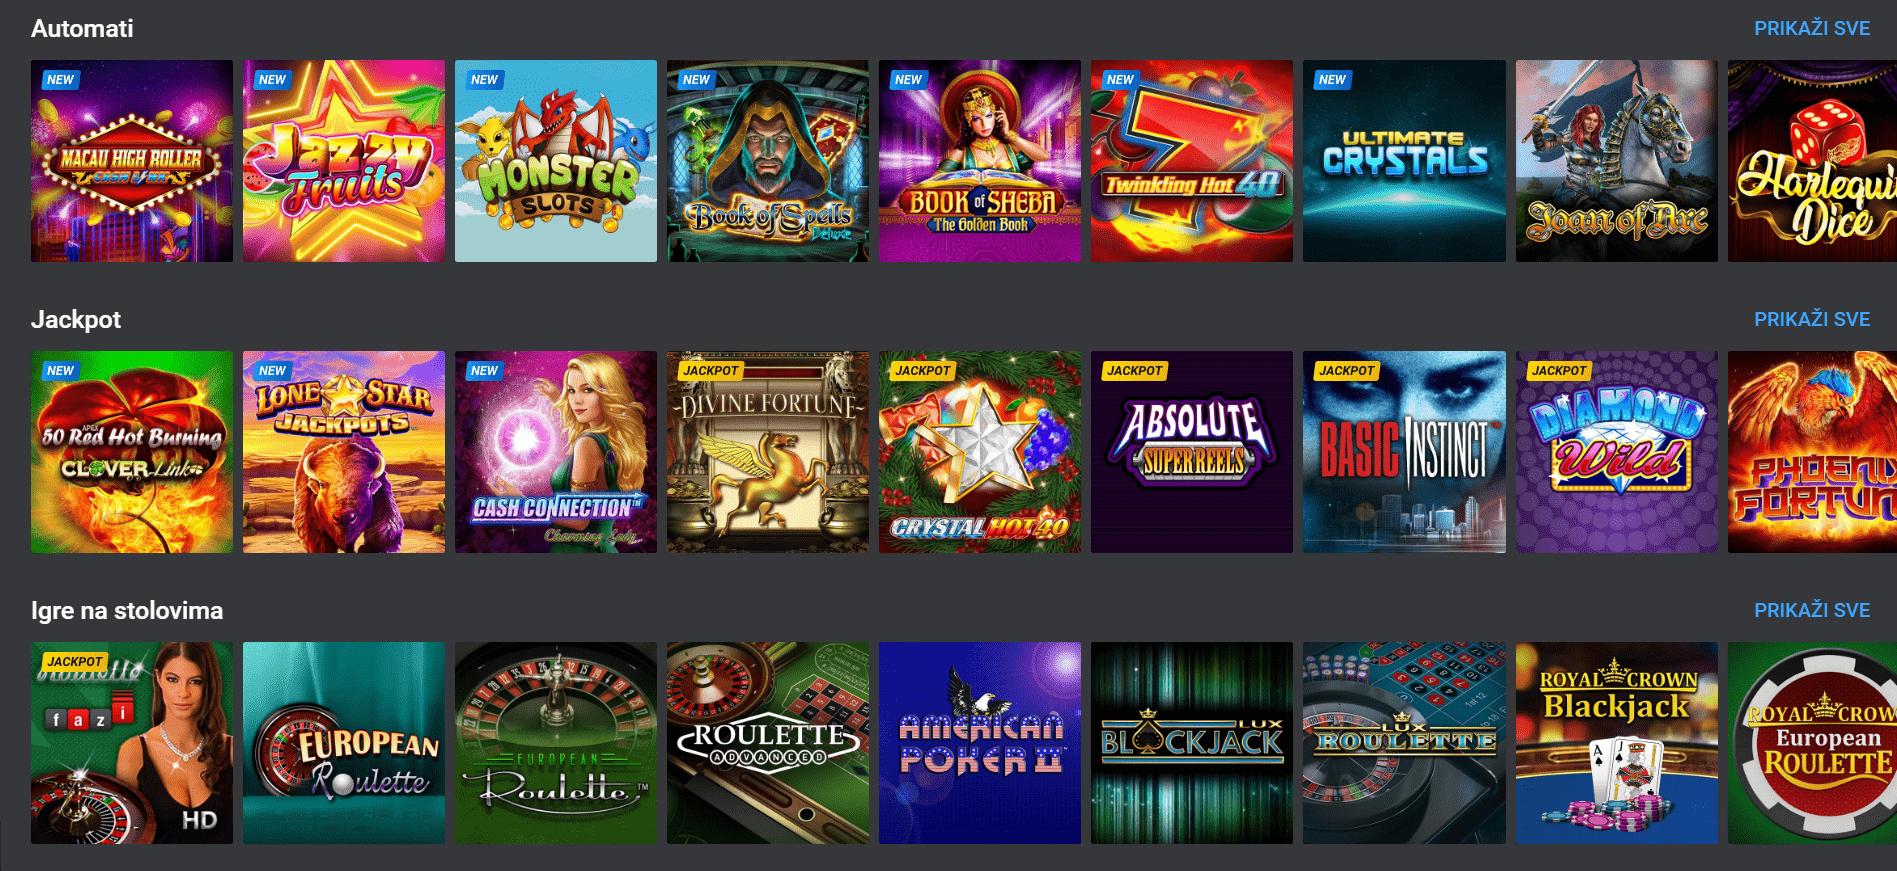 psk casino download